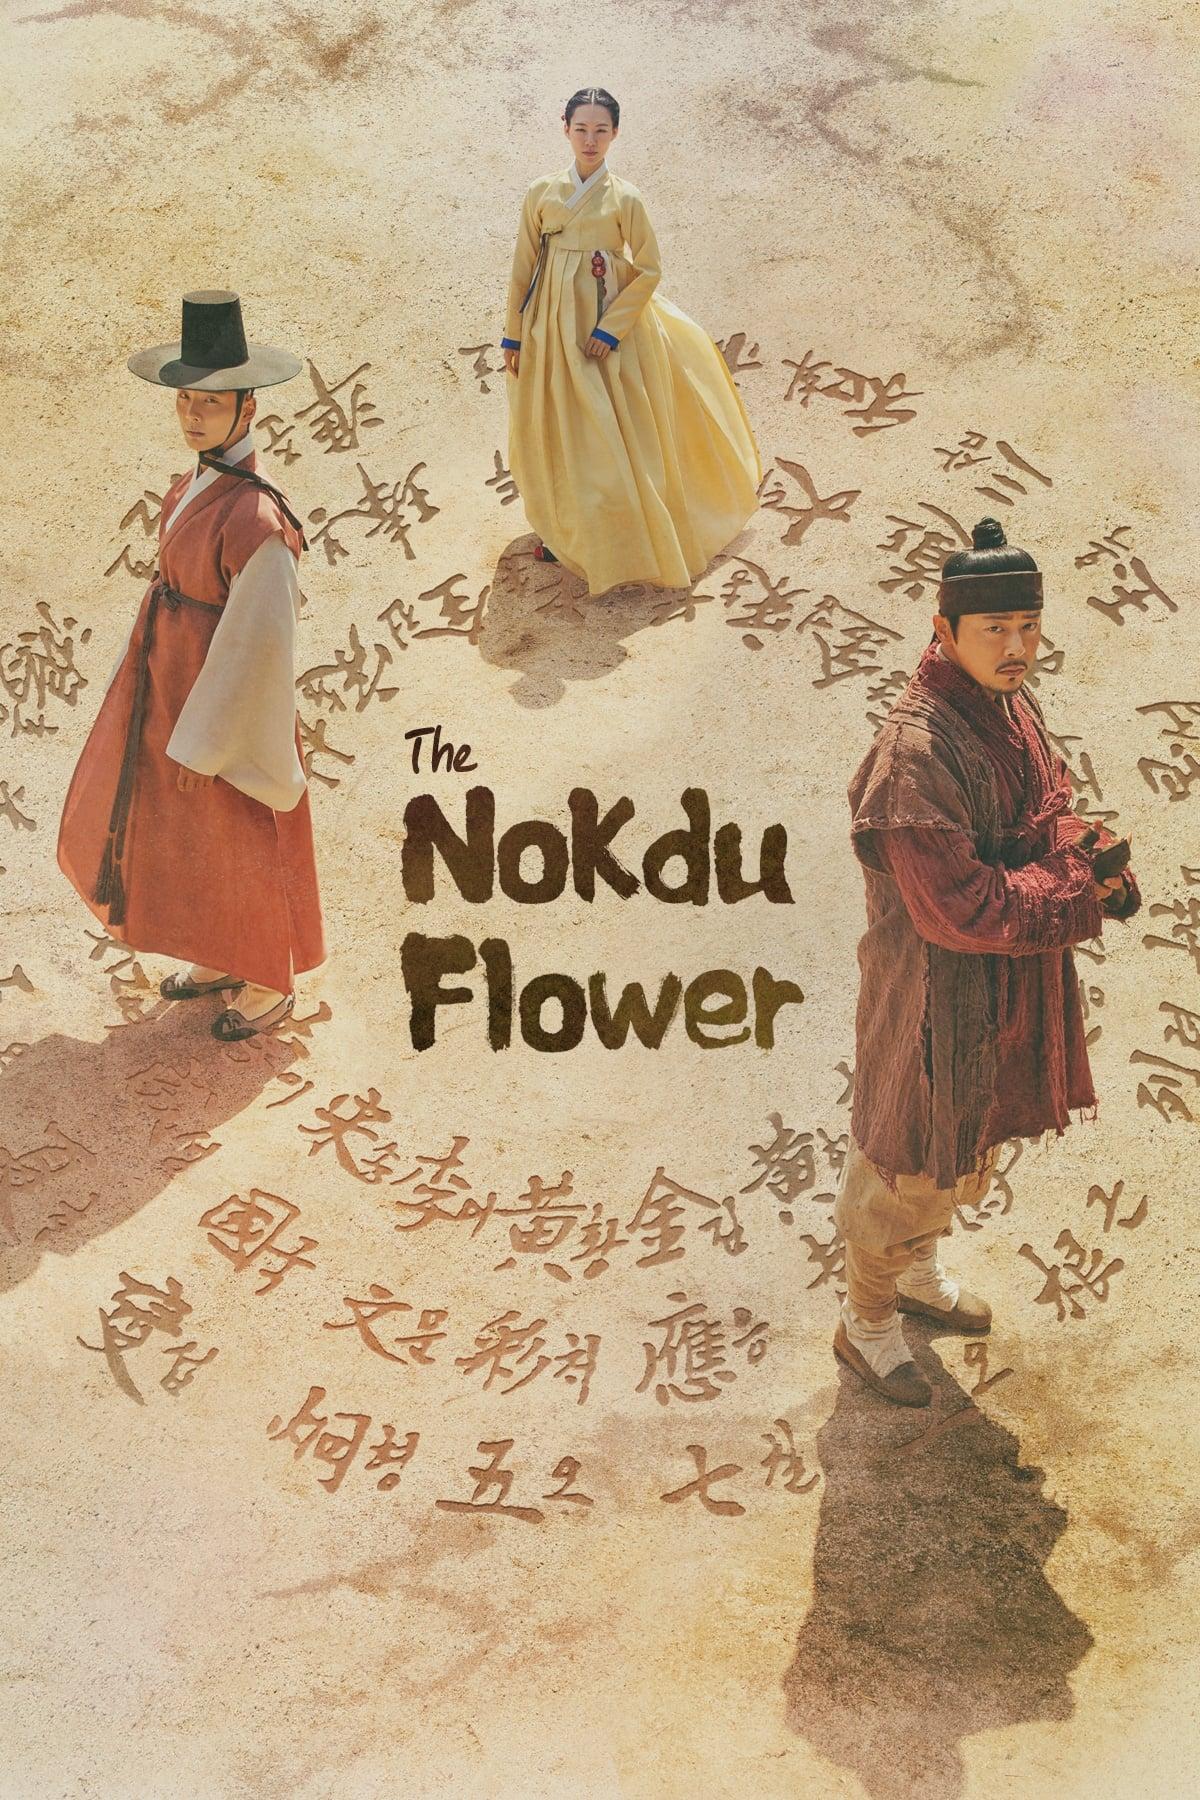 The Nokdu Flower (2019)